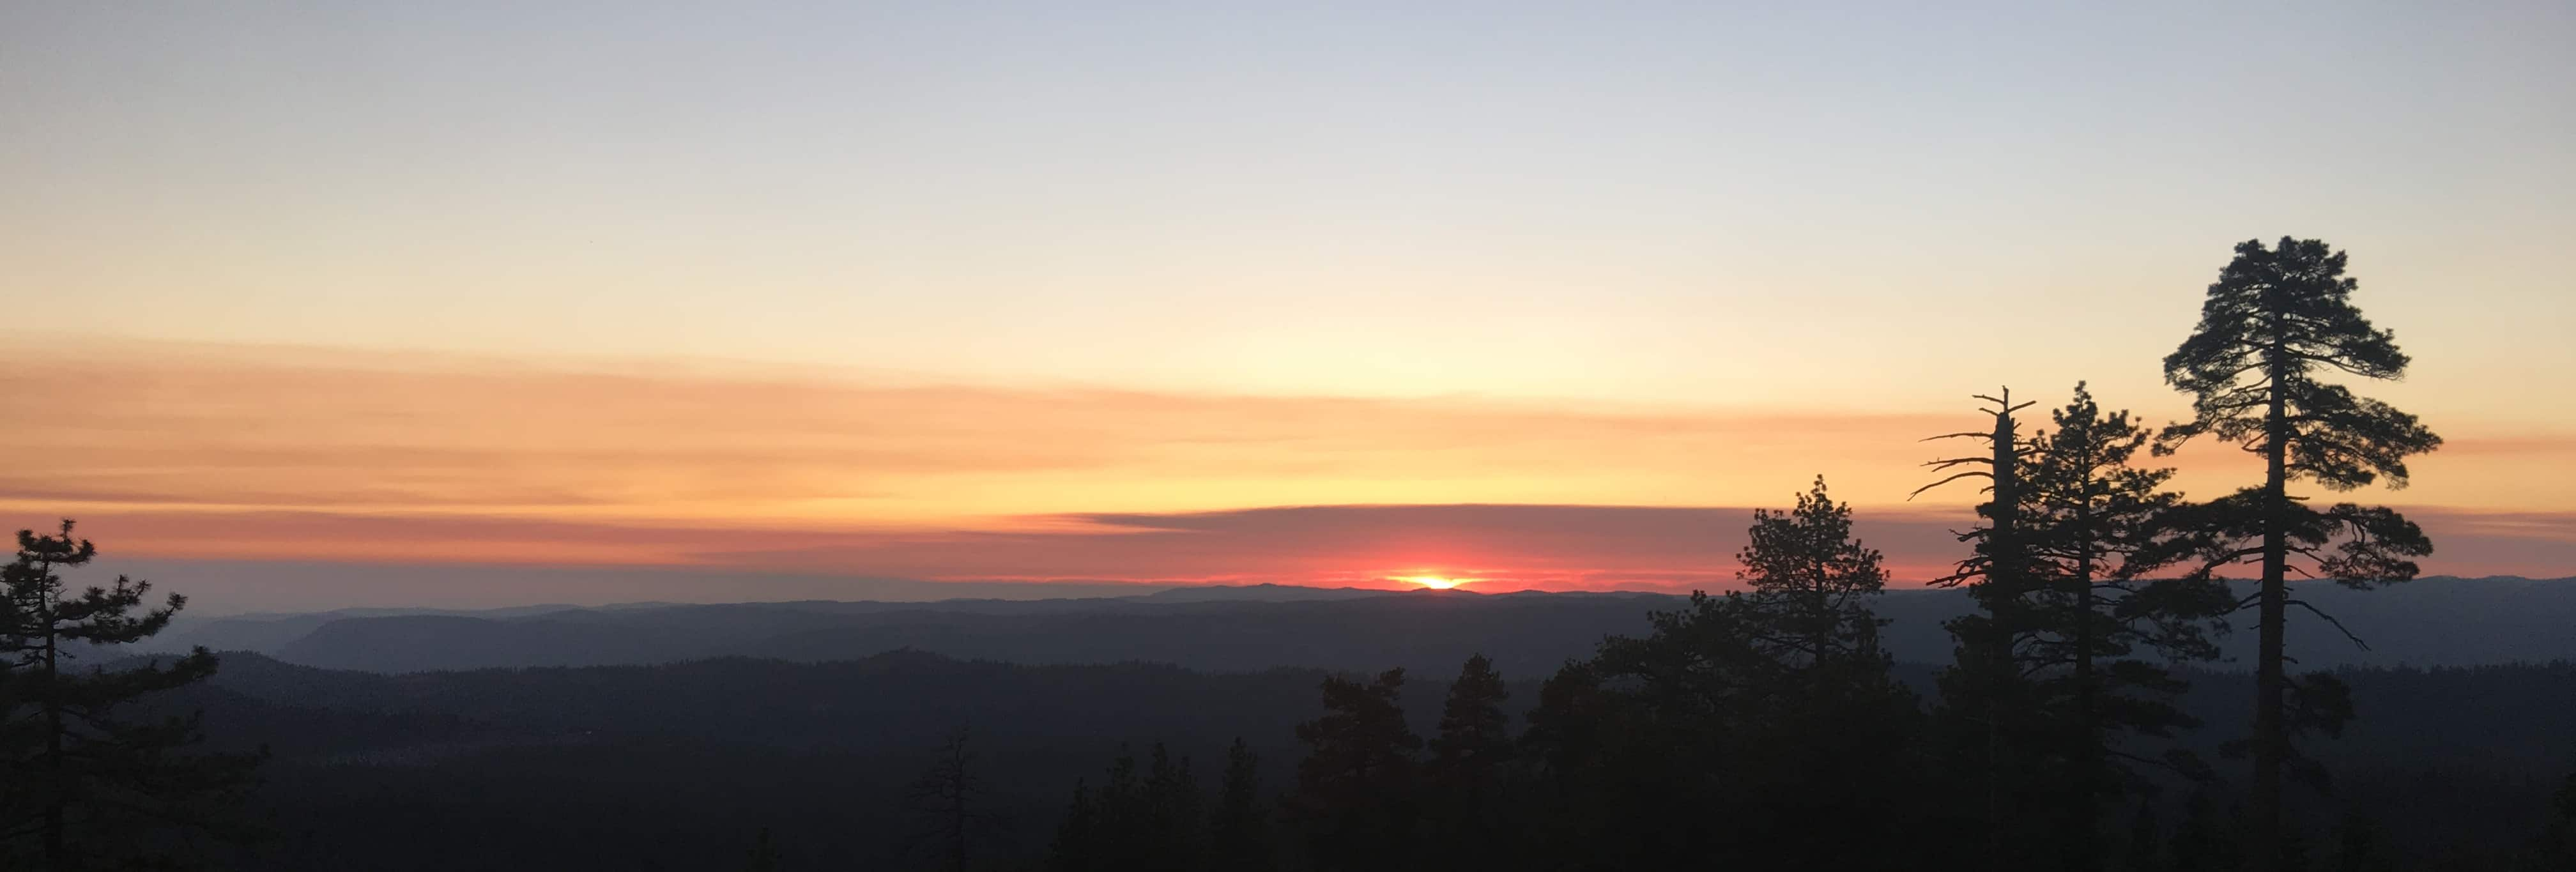 lair sunset